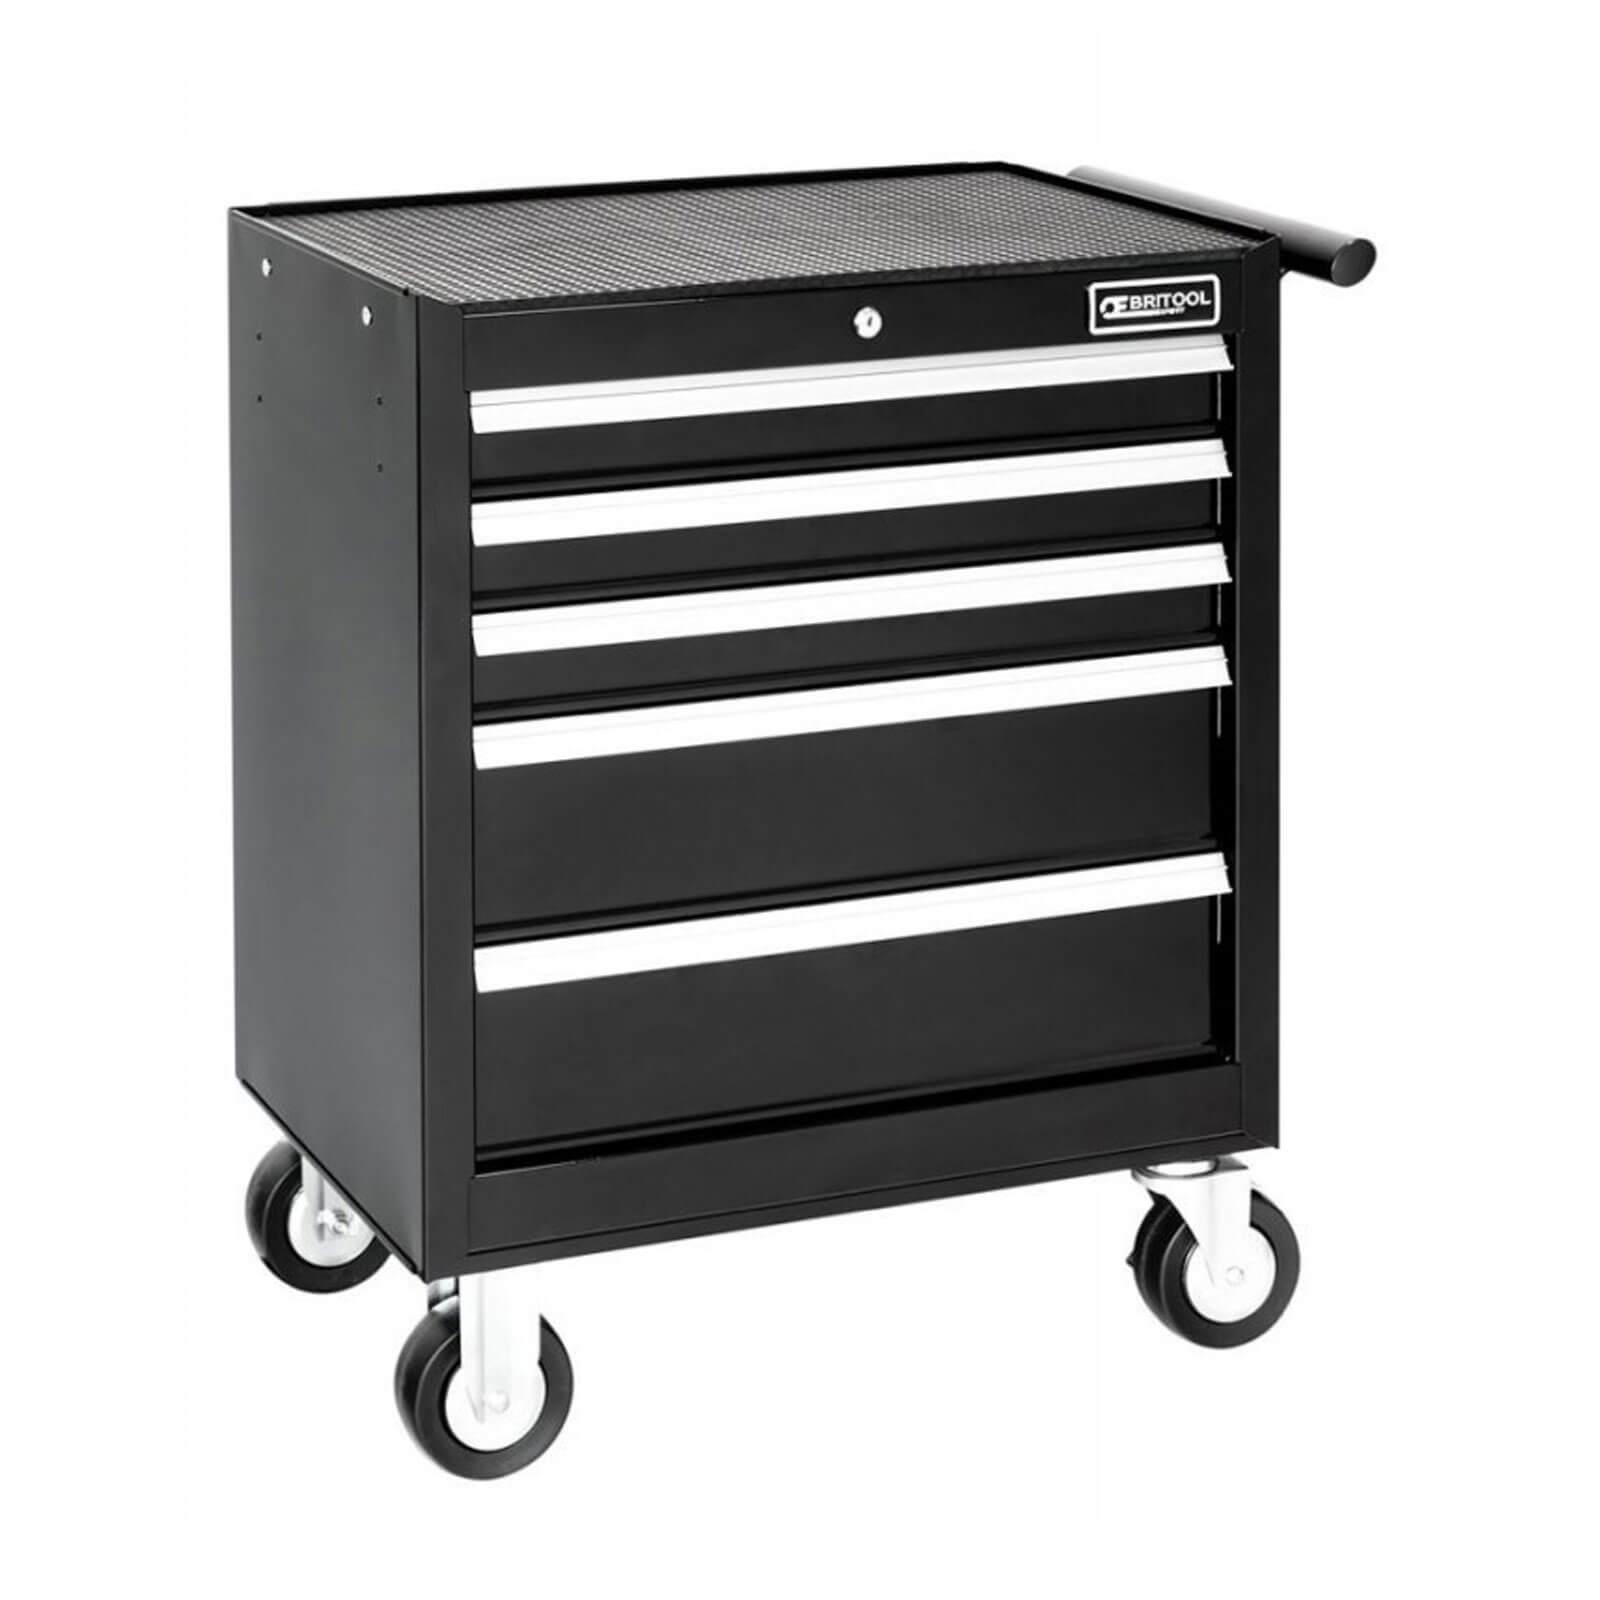 Image of Britool 5 Drawer Roller Cabinet Black